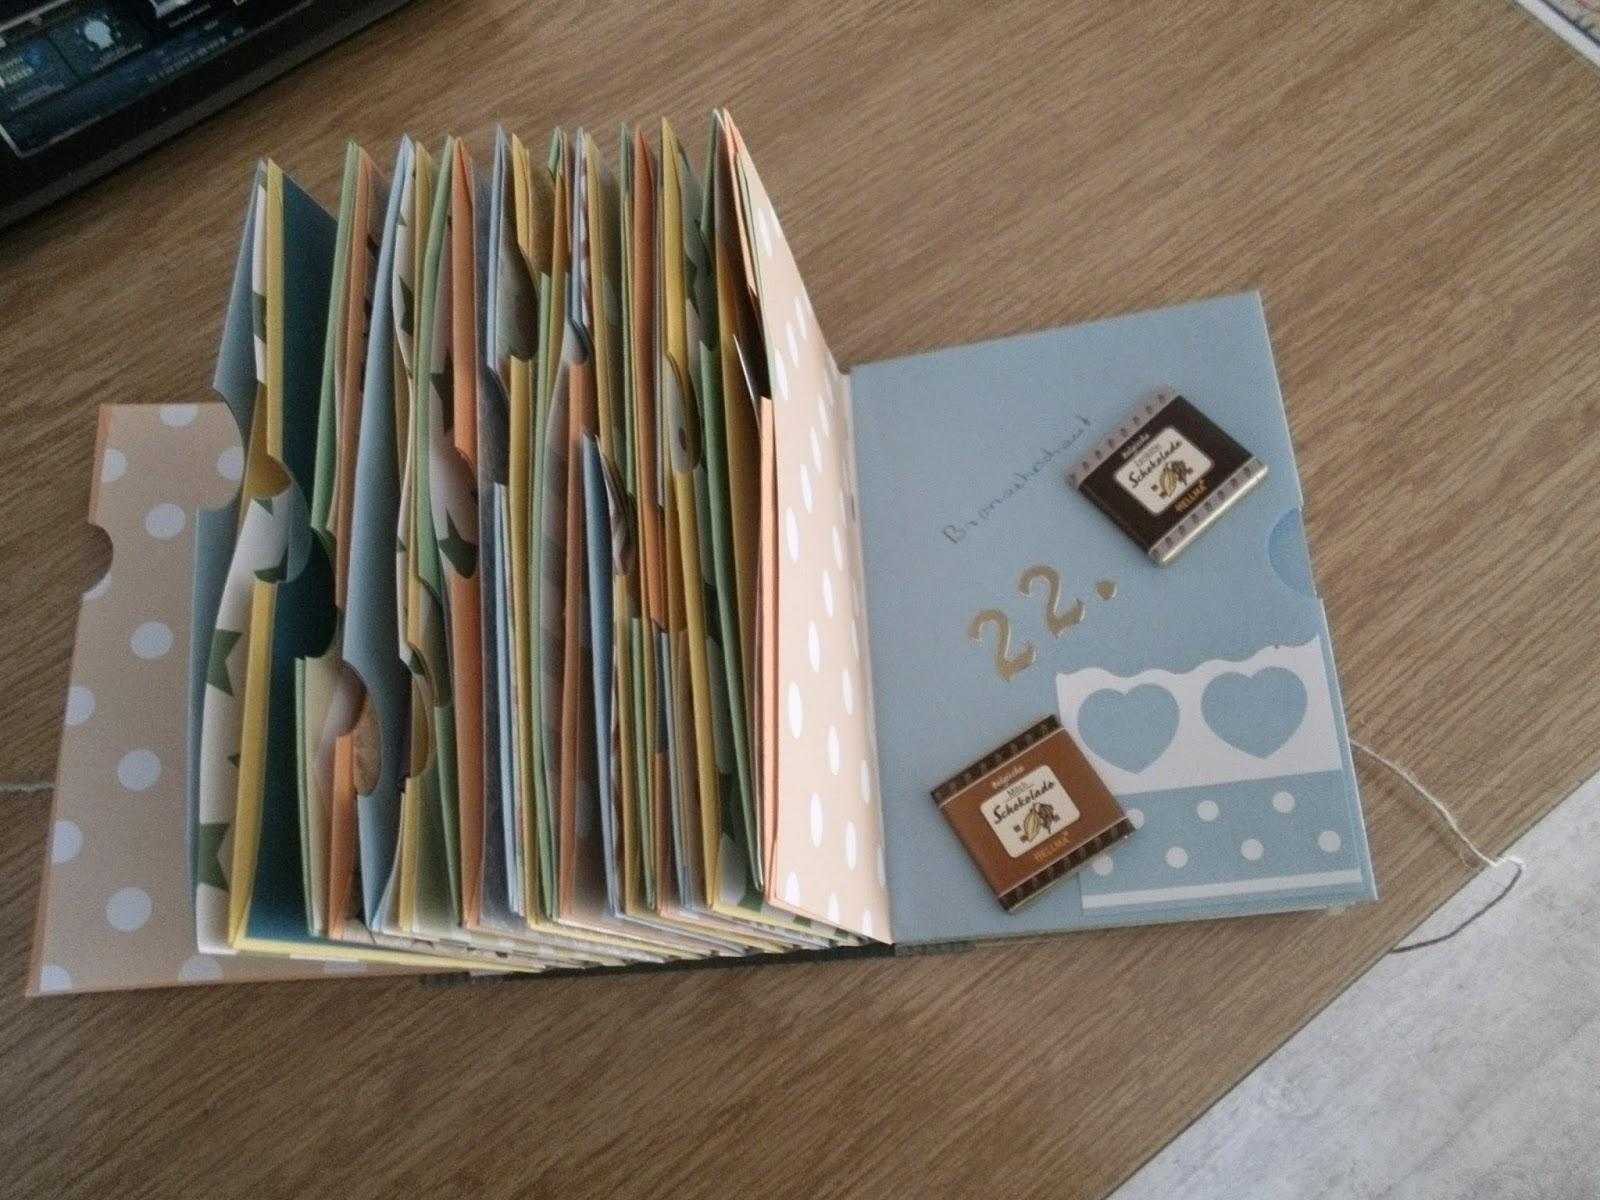 danielas-kartenwerkstatt: mai 2015